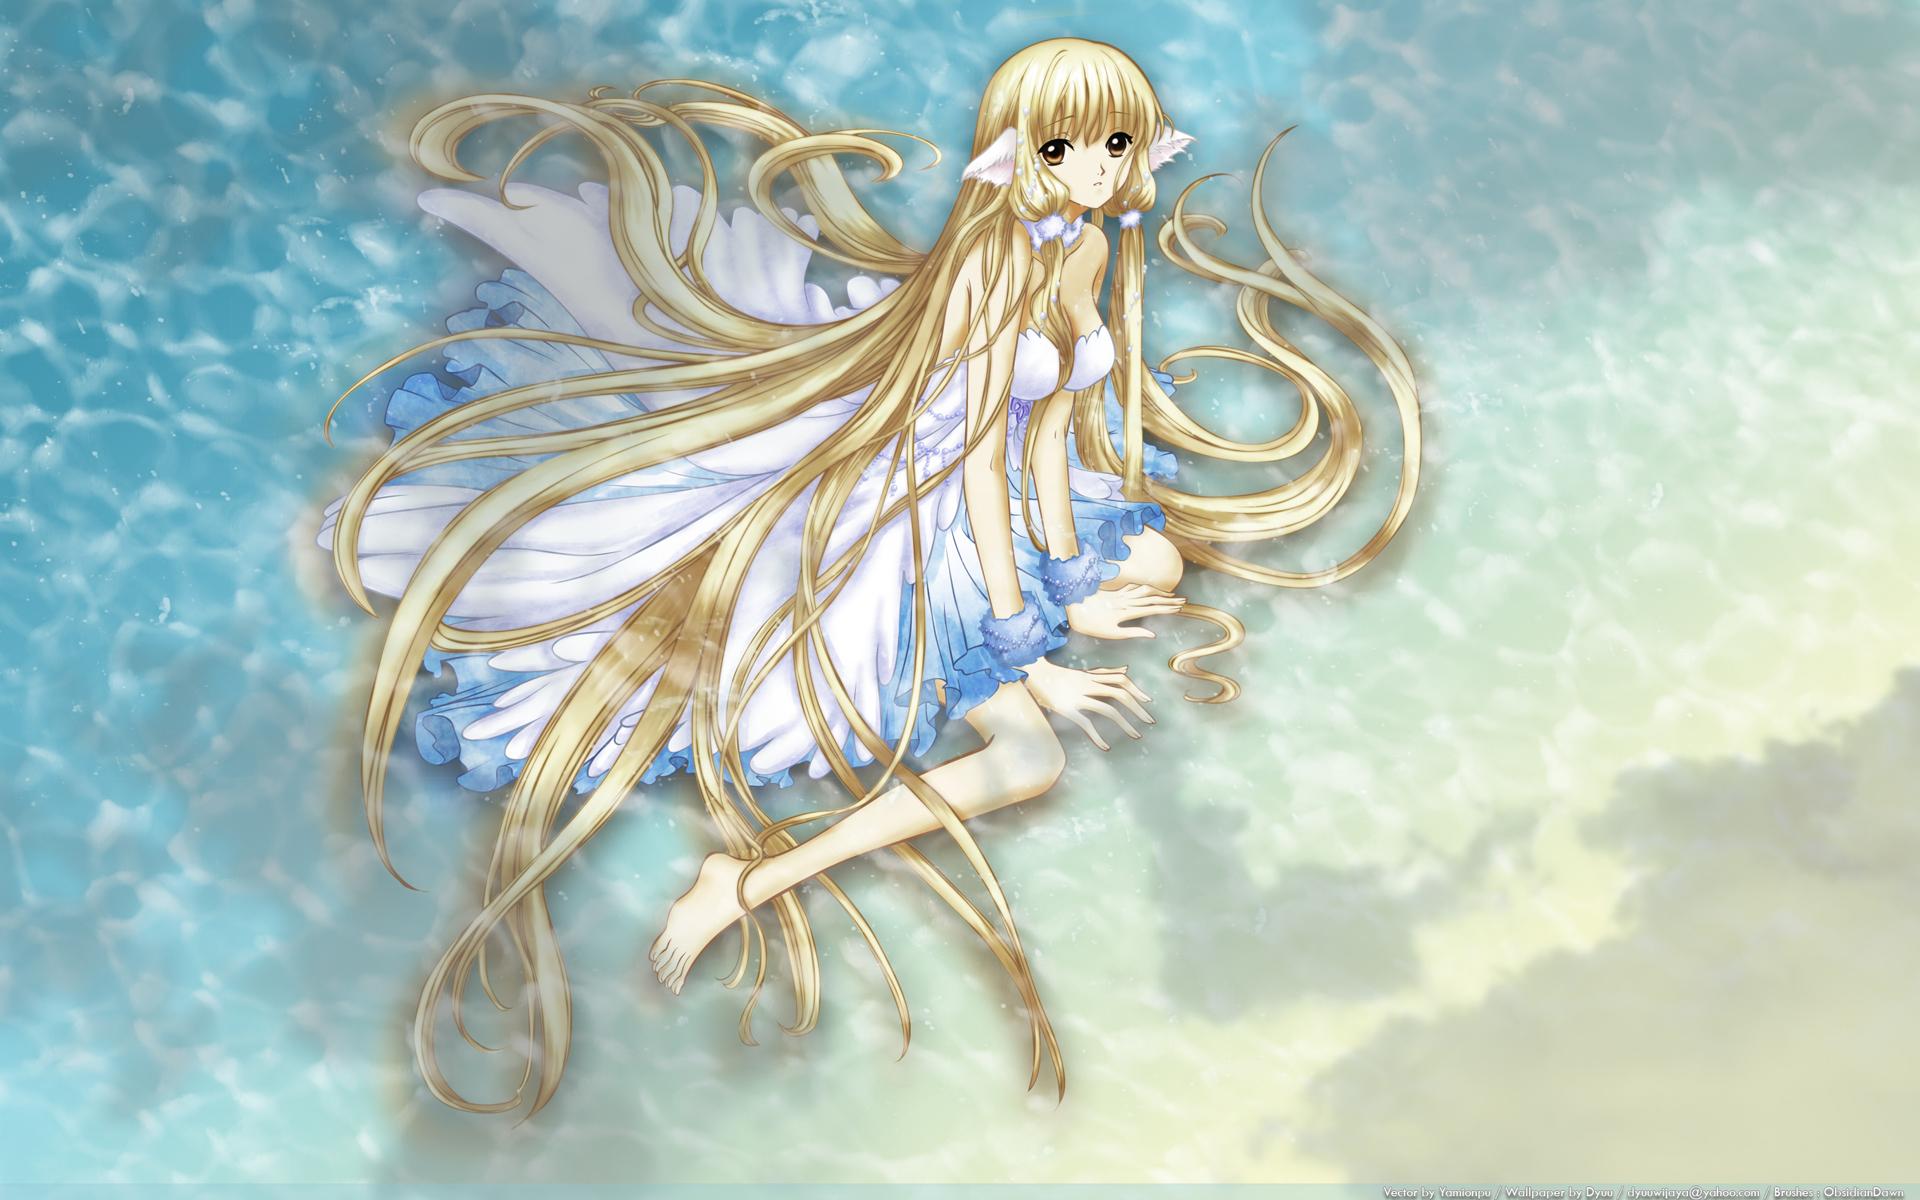 beach blonde_hair brown_eyes chii chobits clamp dress long_hair tsubasa_reservoir_chronicle water wet